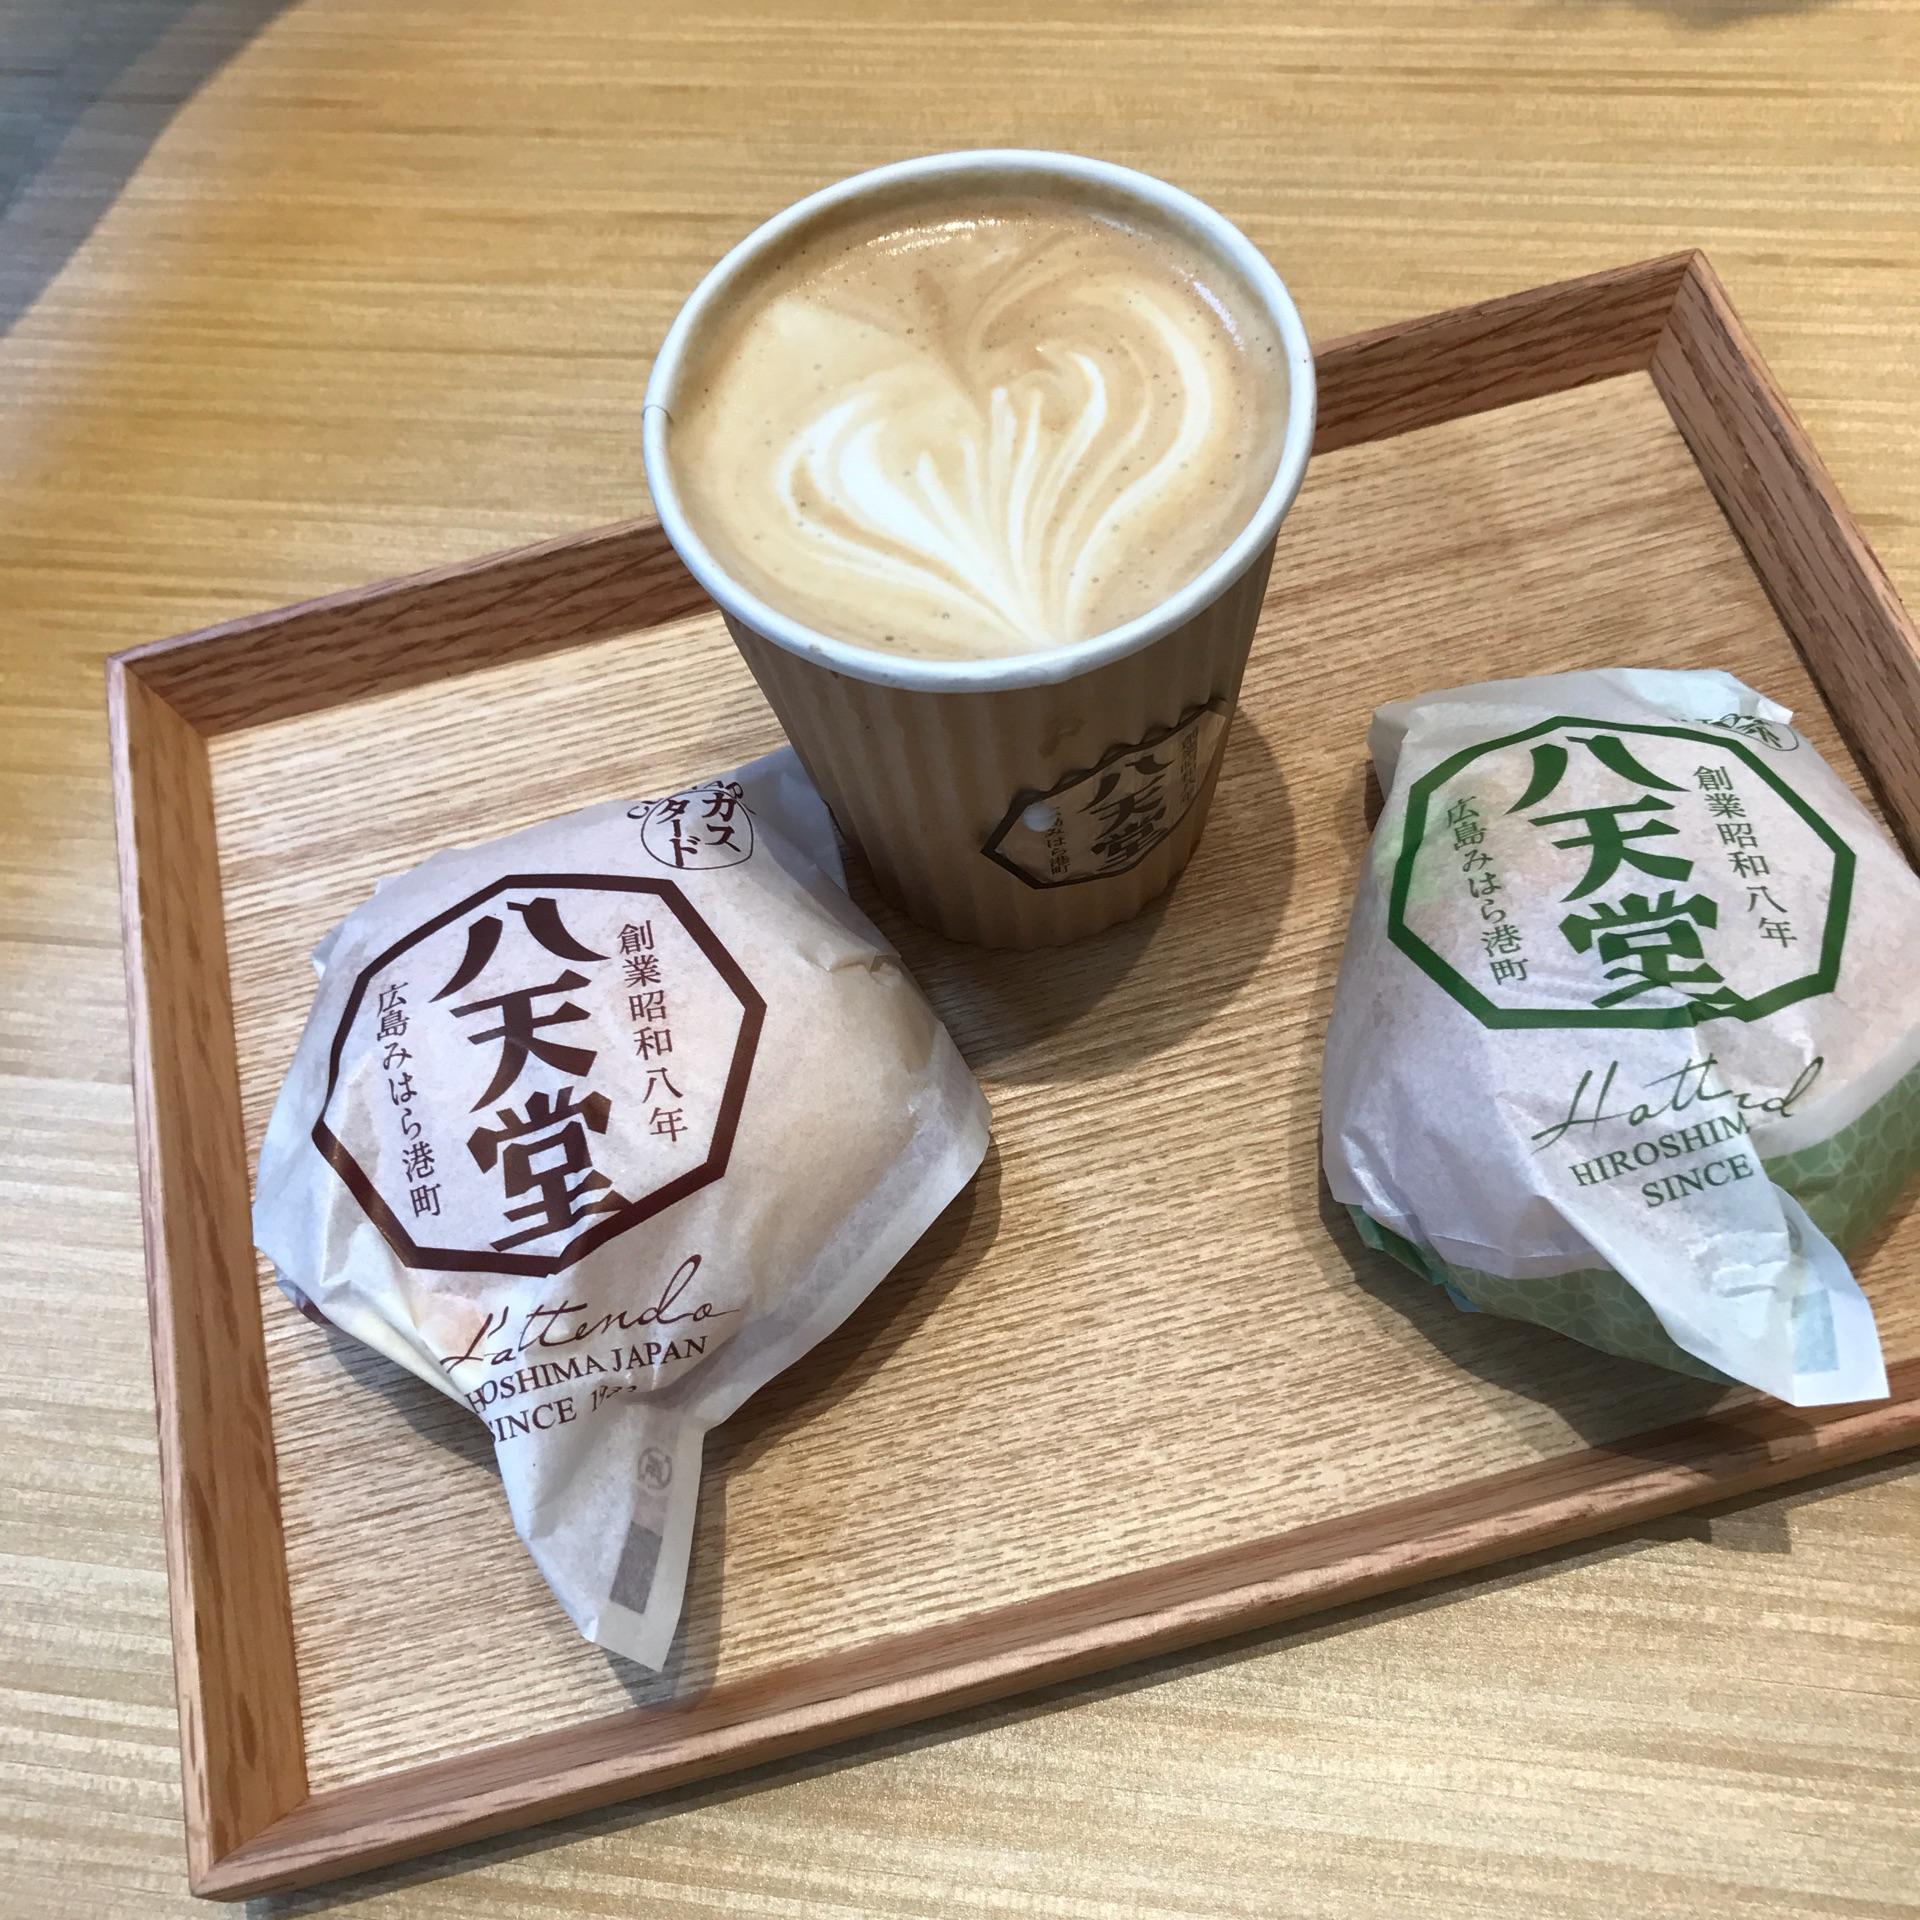 $2.50 cream bun with a hazelnut latte